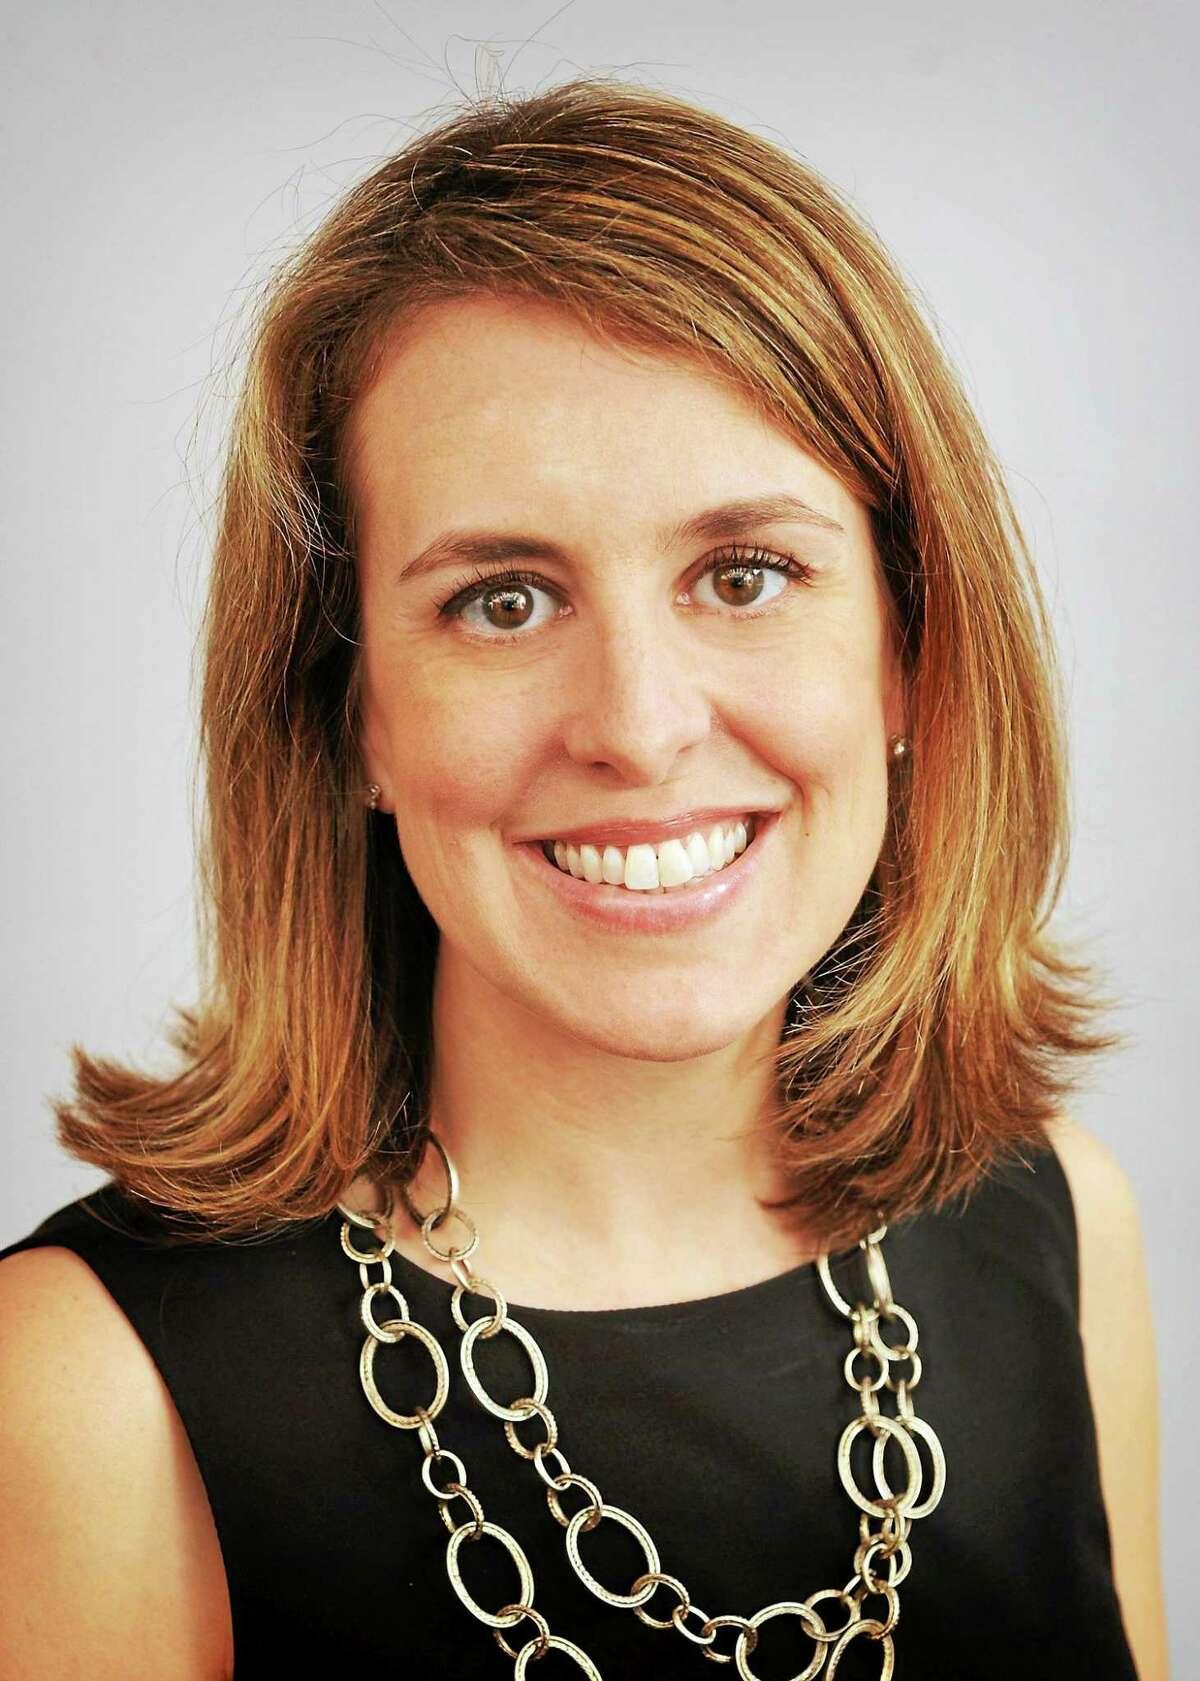 ConnCAN Chief Executive Officer Jennifer Alexander